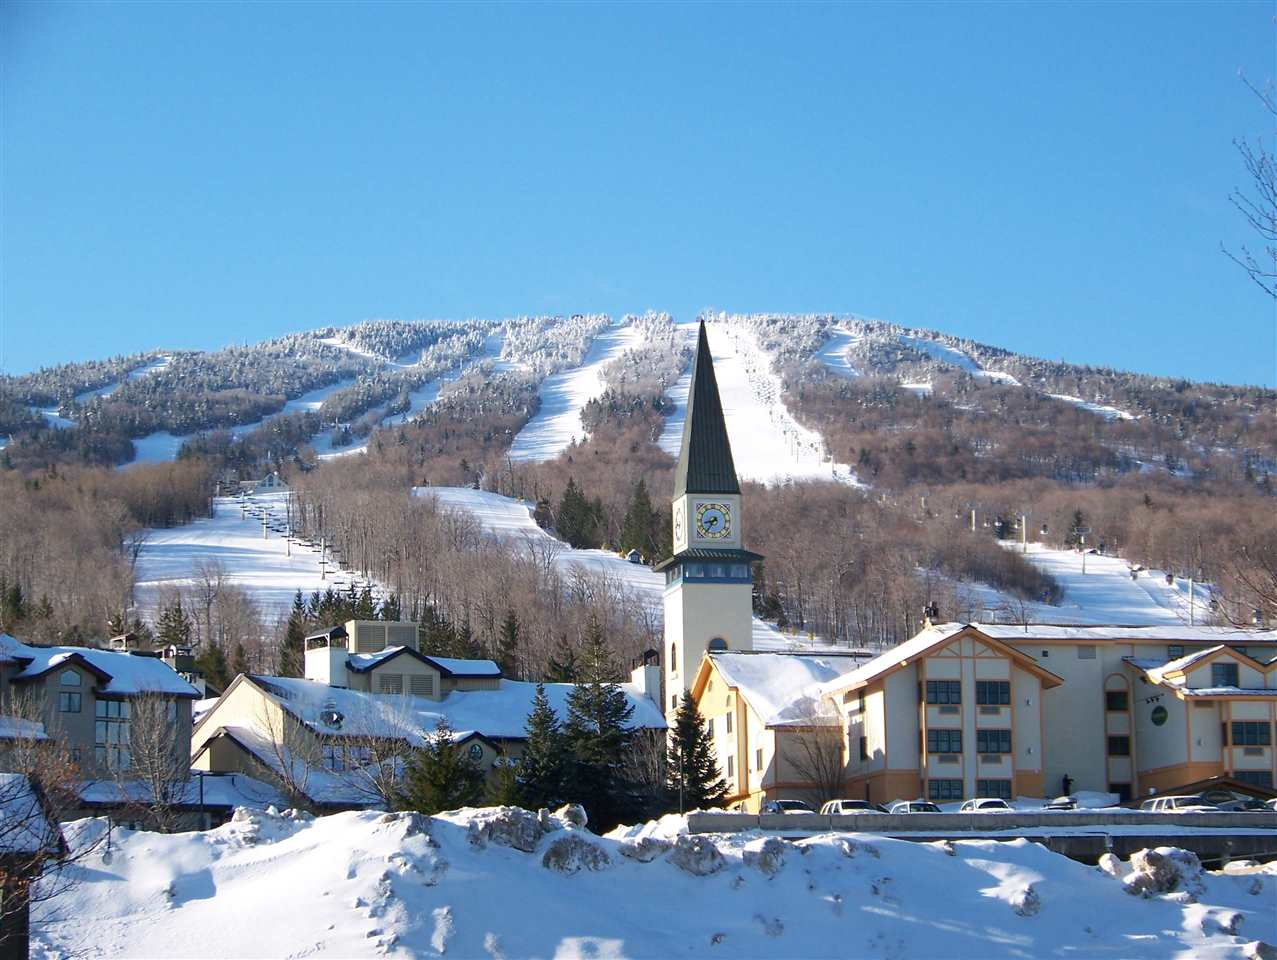 Mount-Snow-Real-Estate-4608742-6